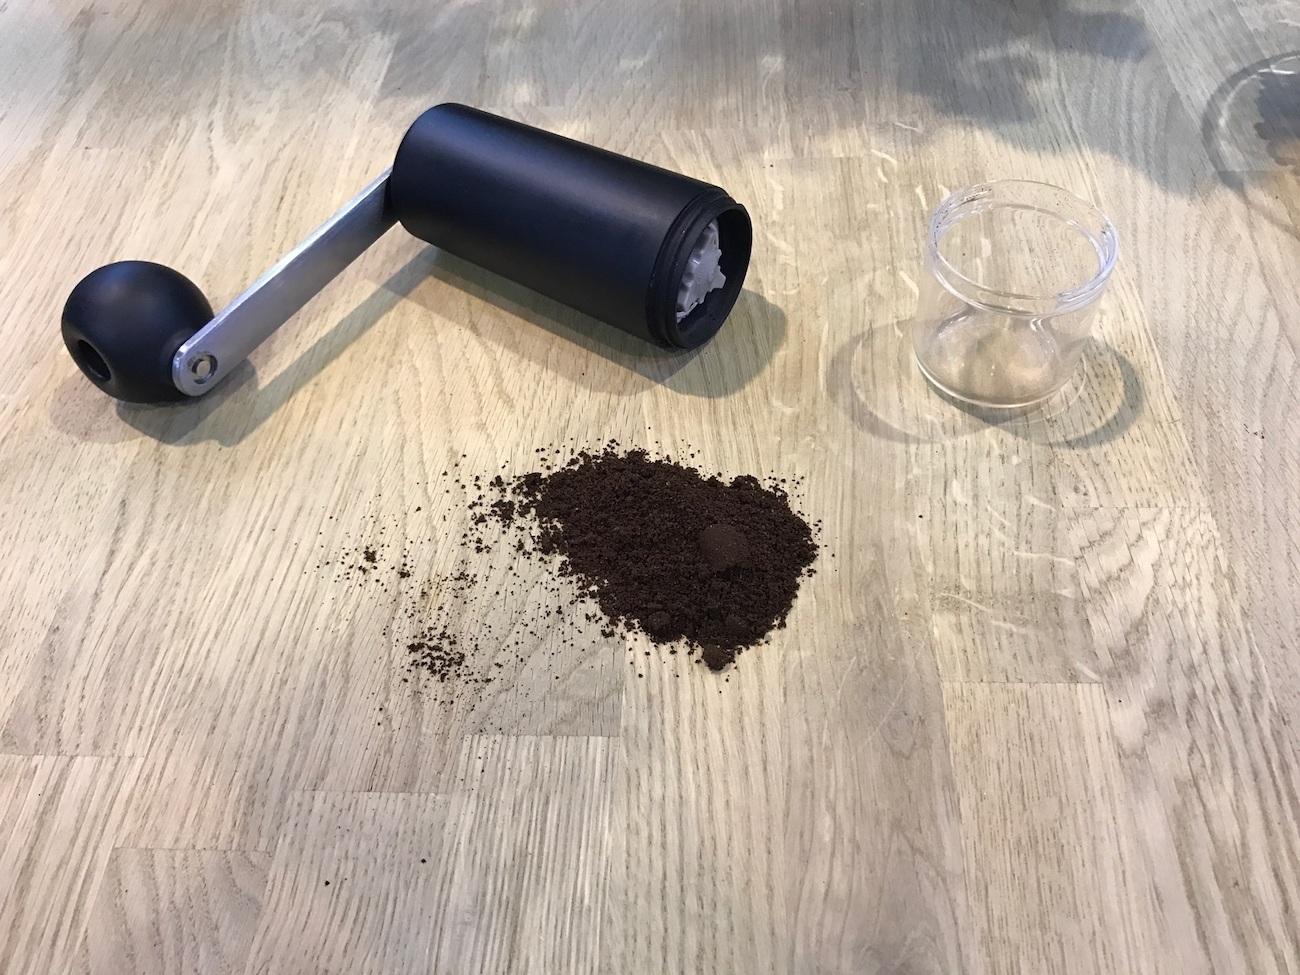 Versatile Coffee Grinder